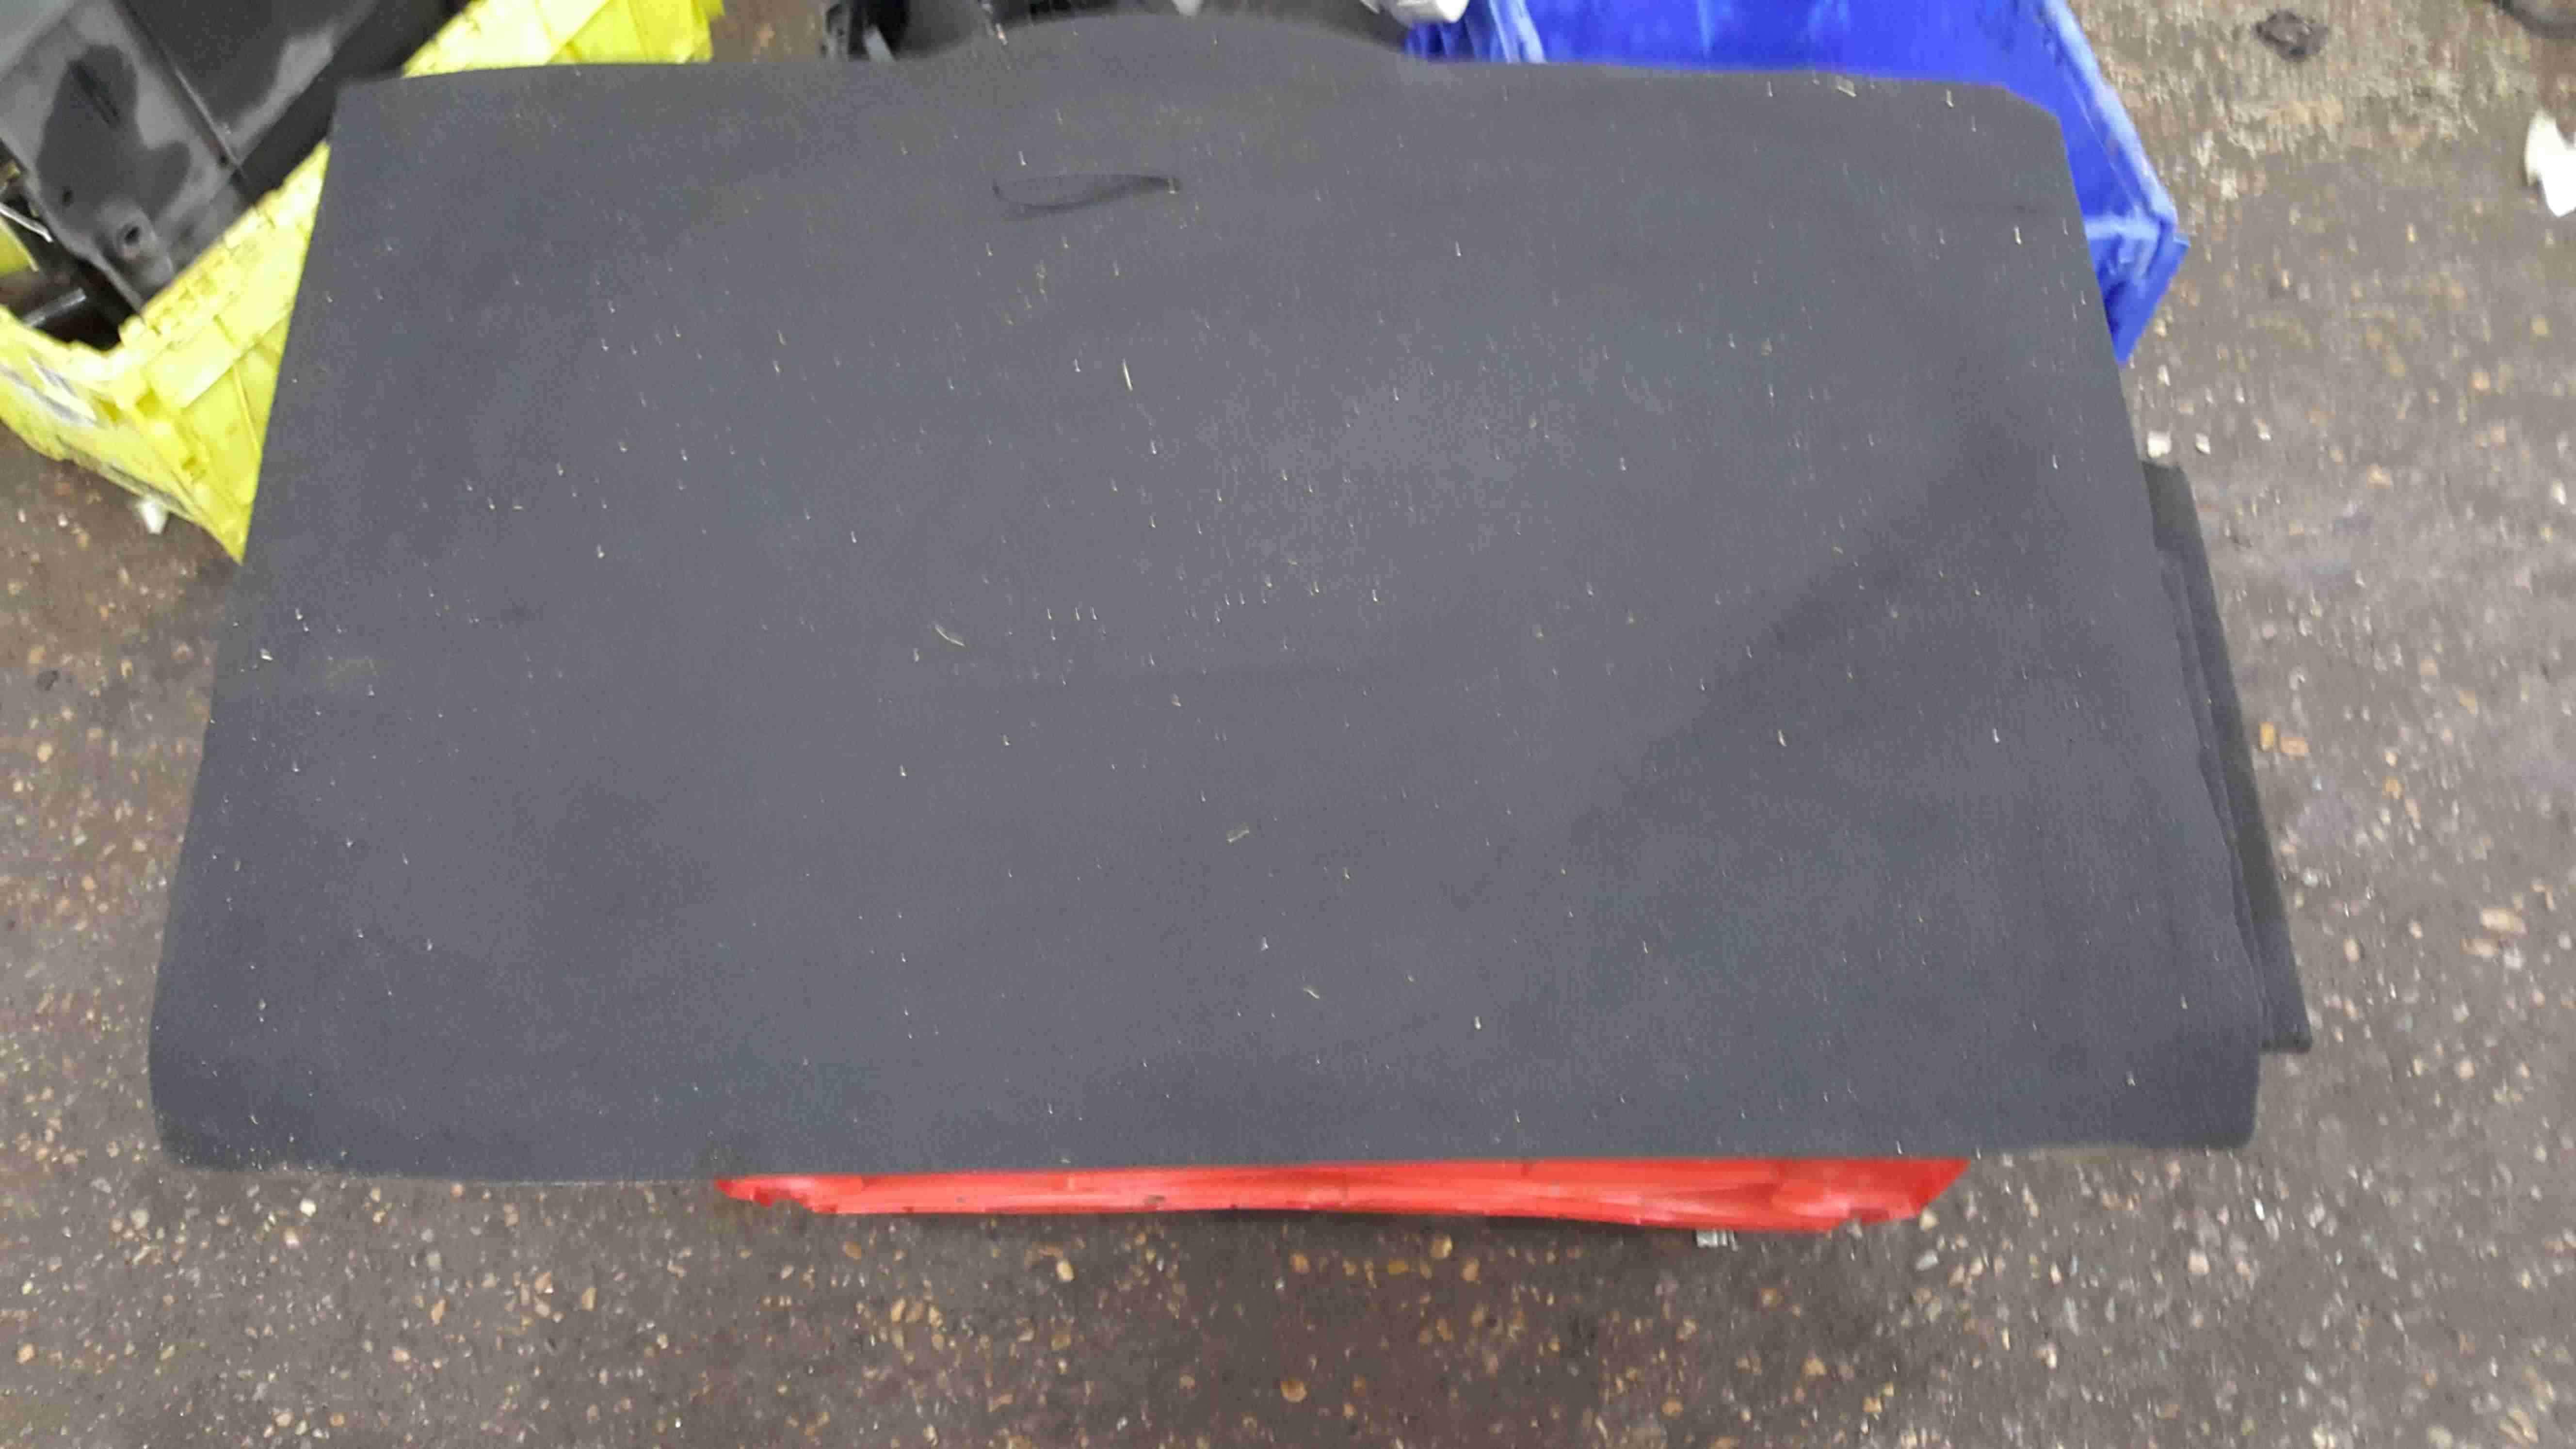 Renault Kadjar 2015-2021 Boot Carpet Mat Cover 849025307r